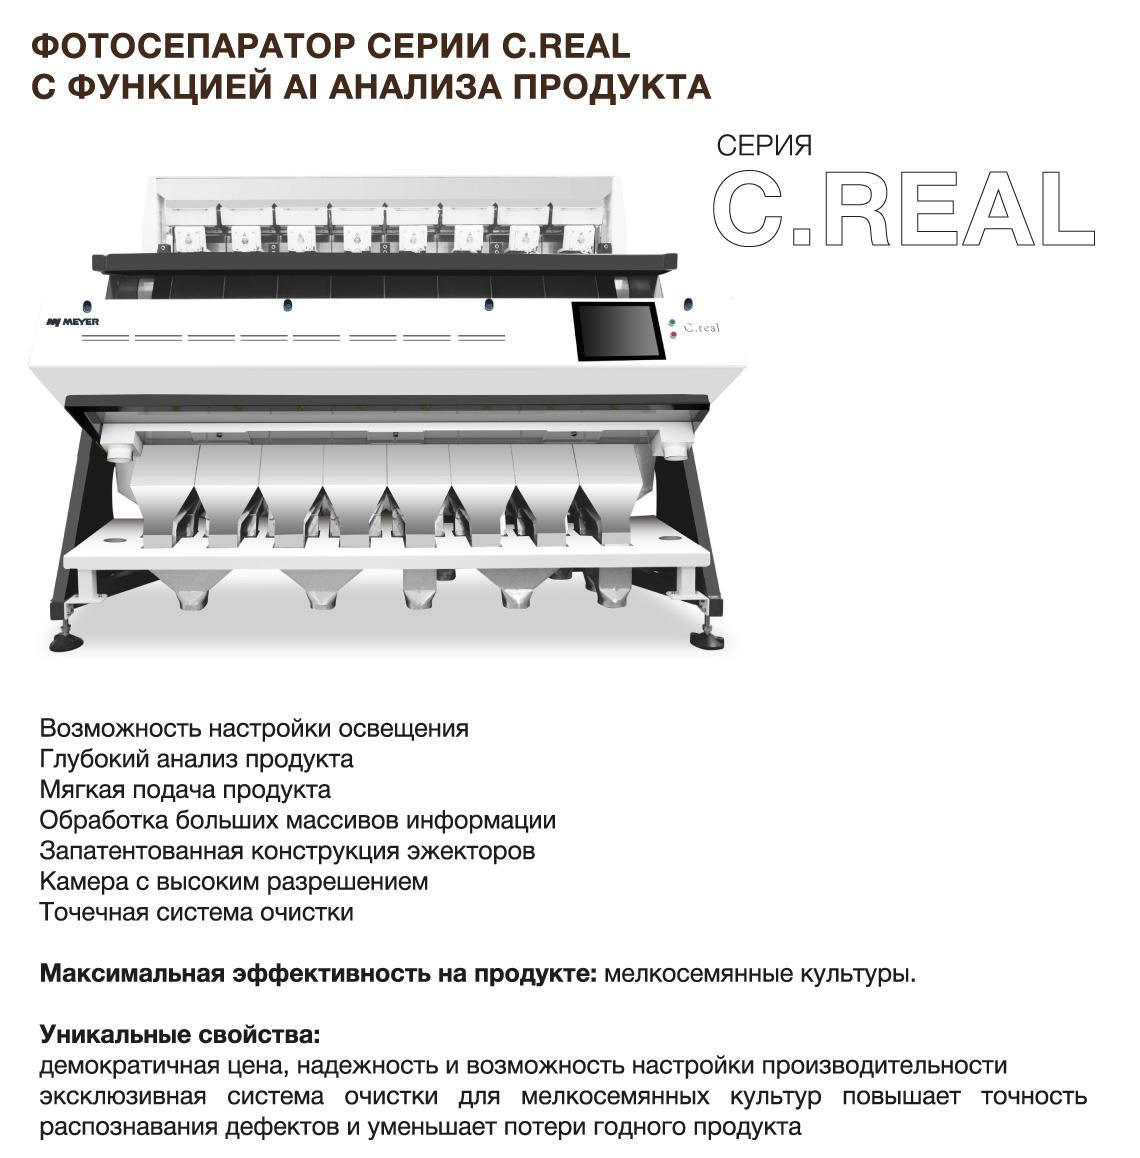 Meyer C.REAL